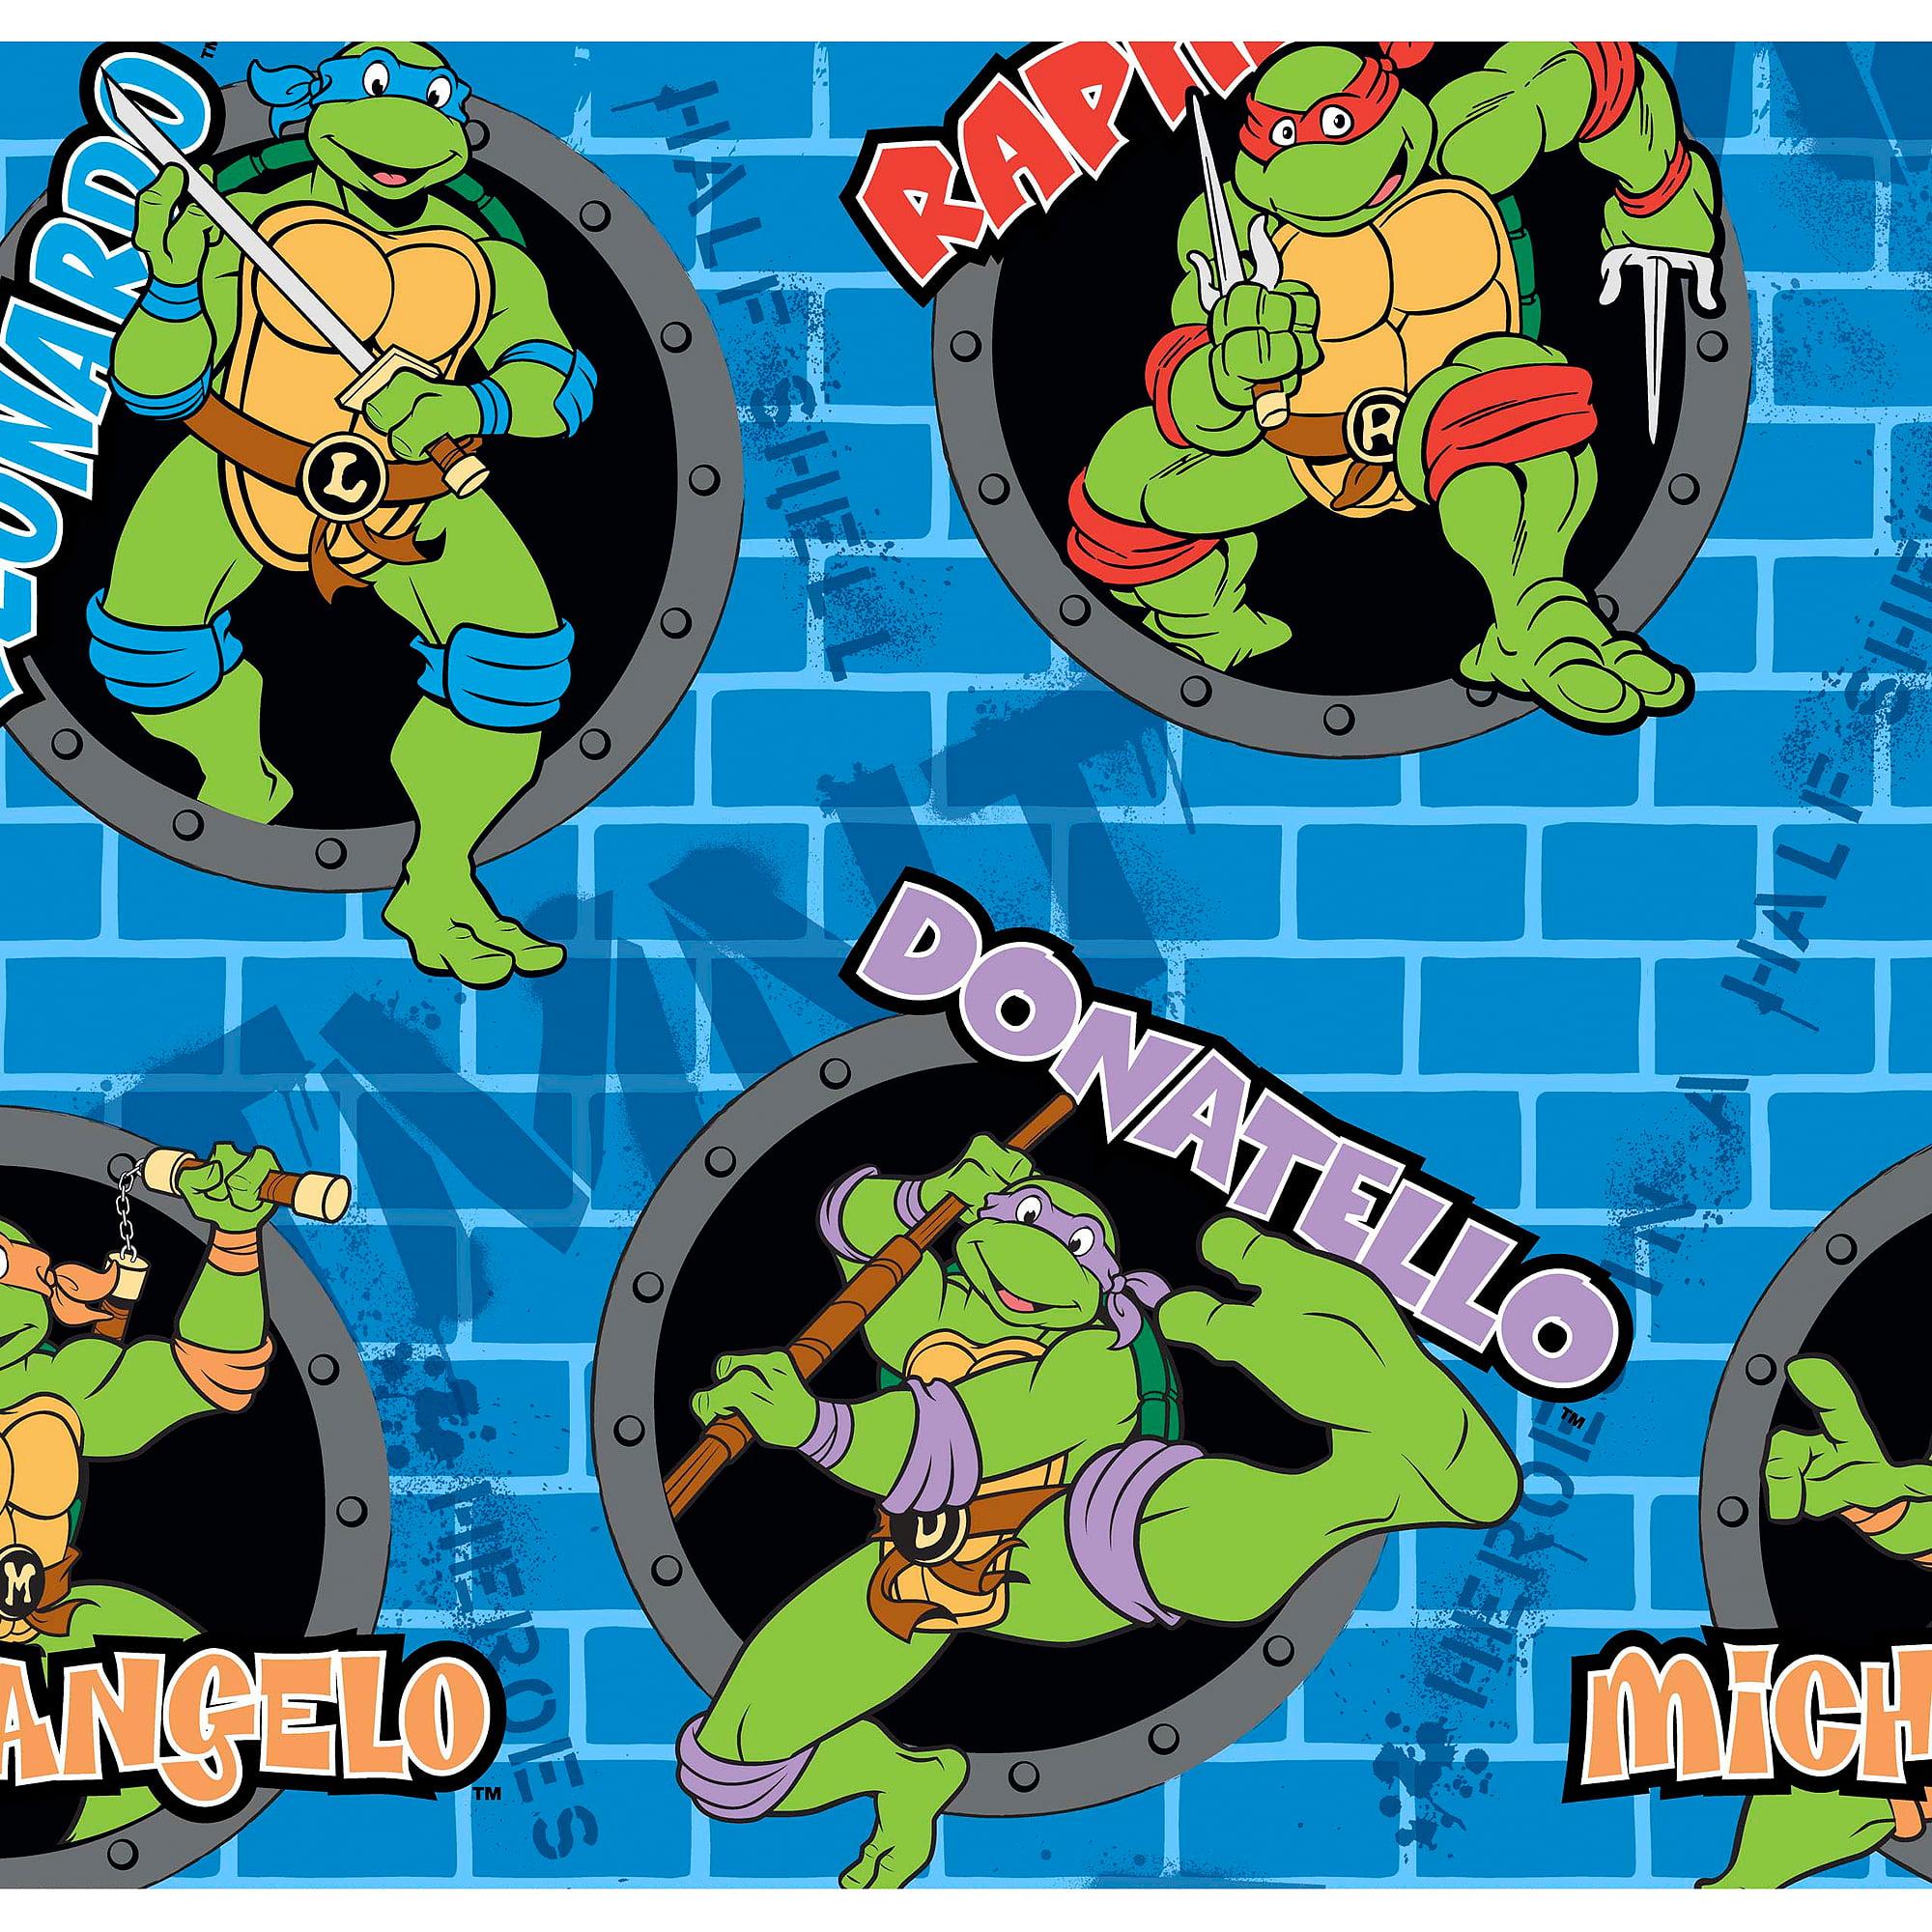 Teenage Mutant Ninja Turtles Power Sewer Holes and Names Fleece Fabric by the Yard